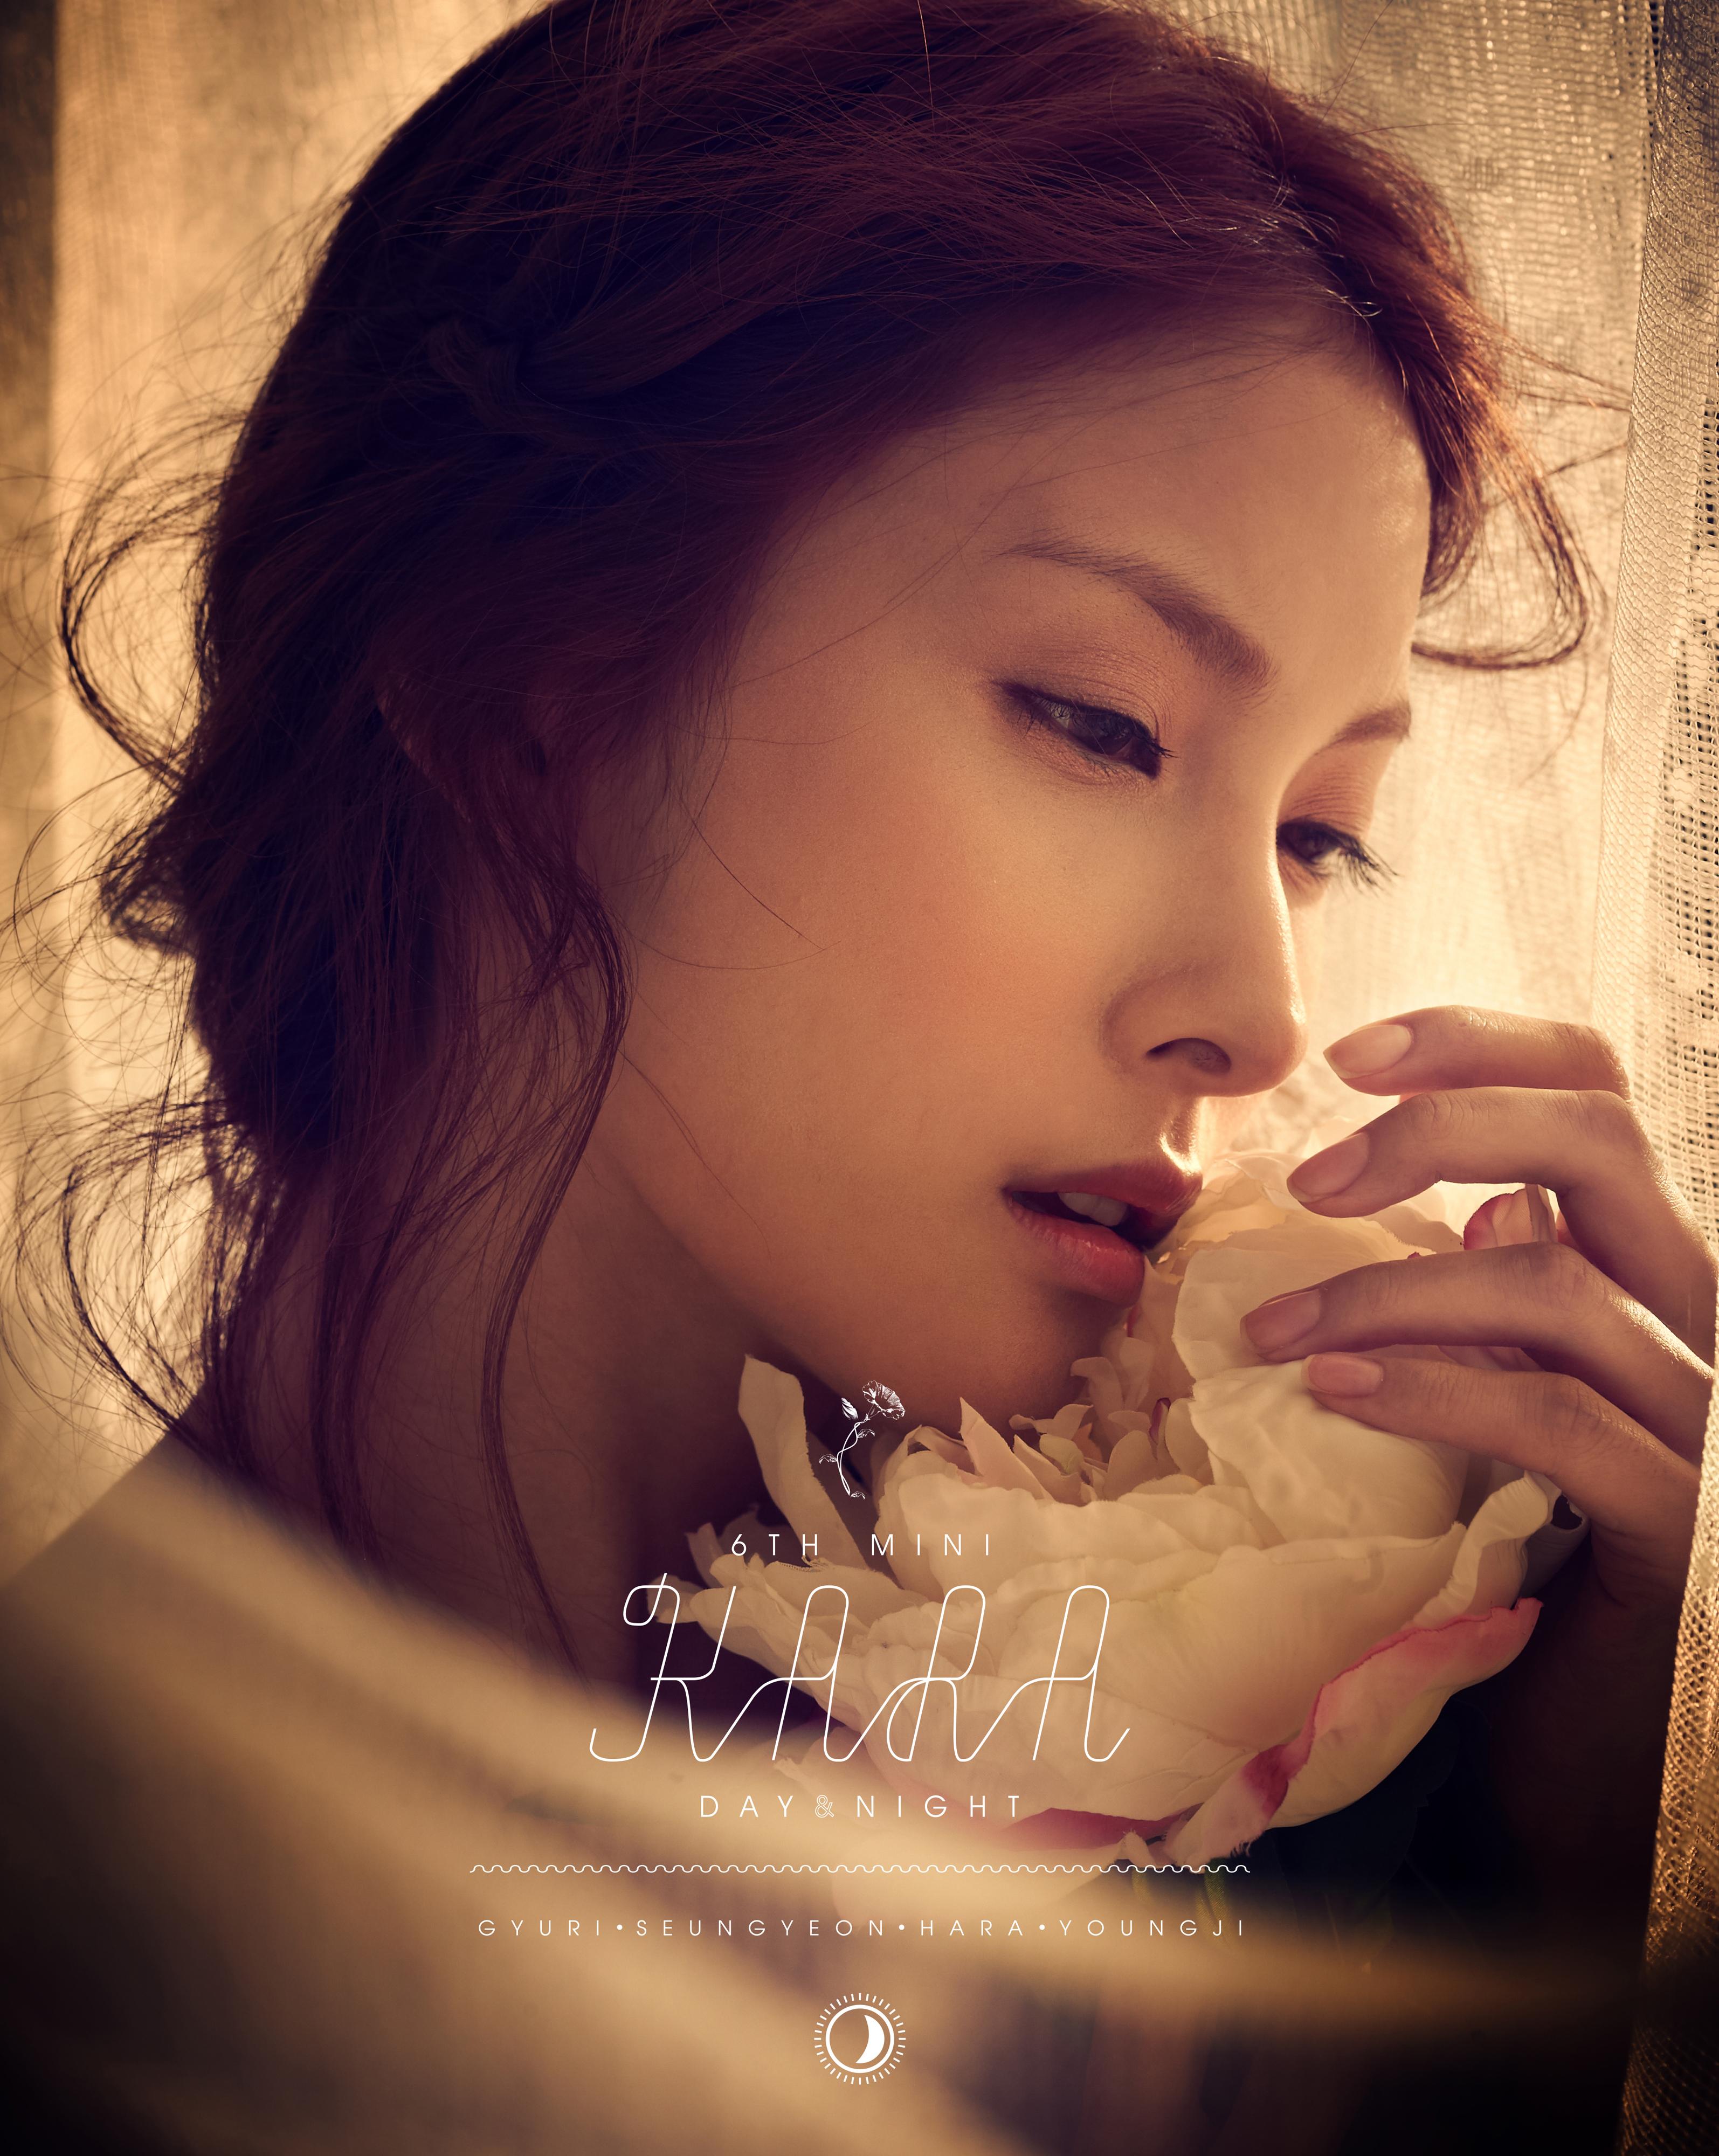 KARA Gyuri 'Day & Night' Teaser 3 HQ